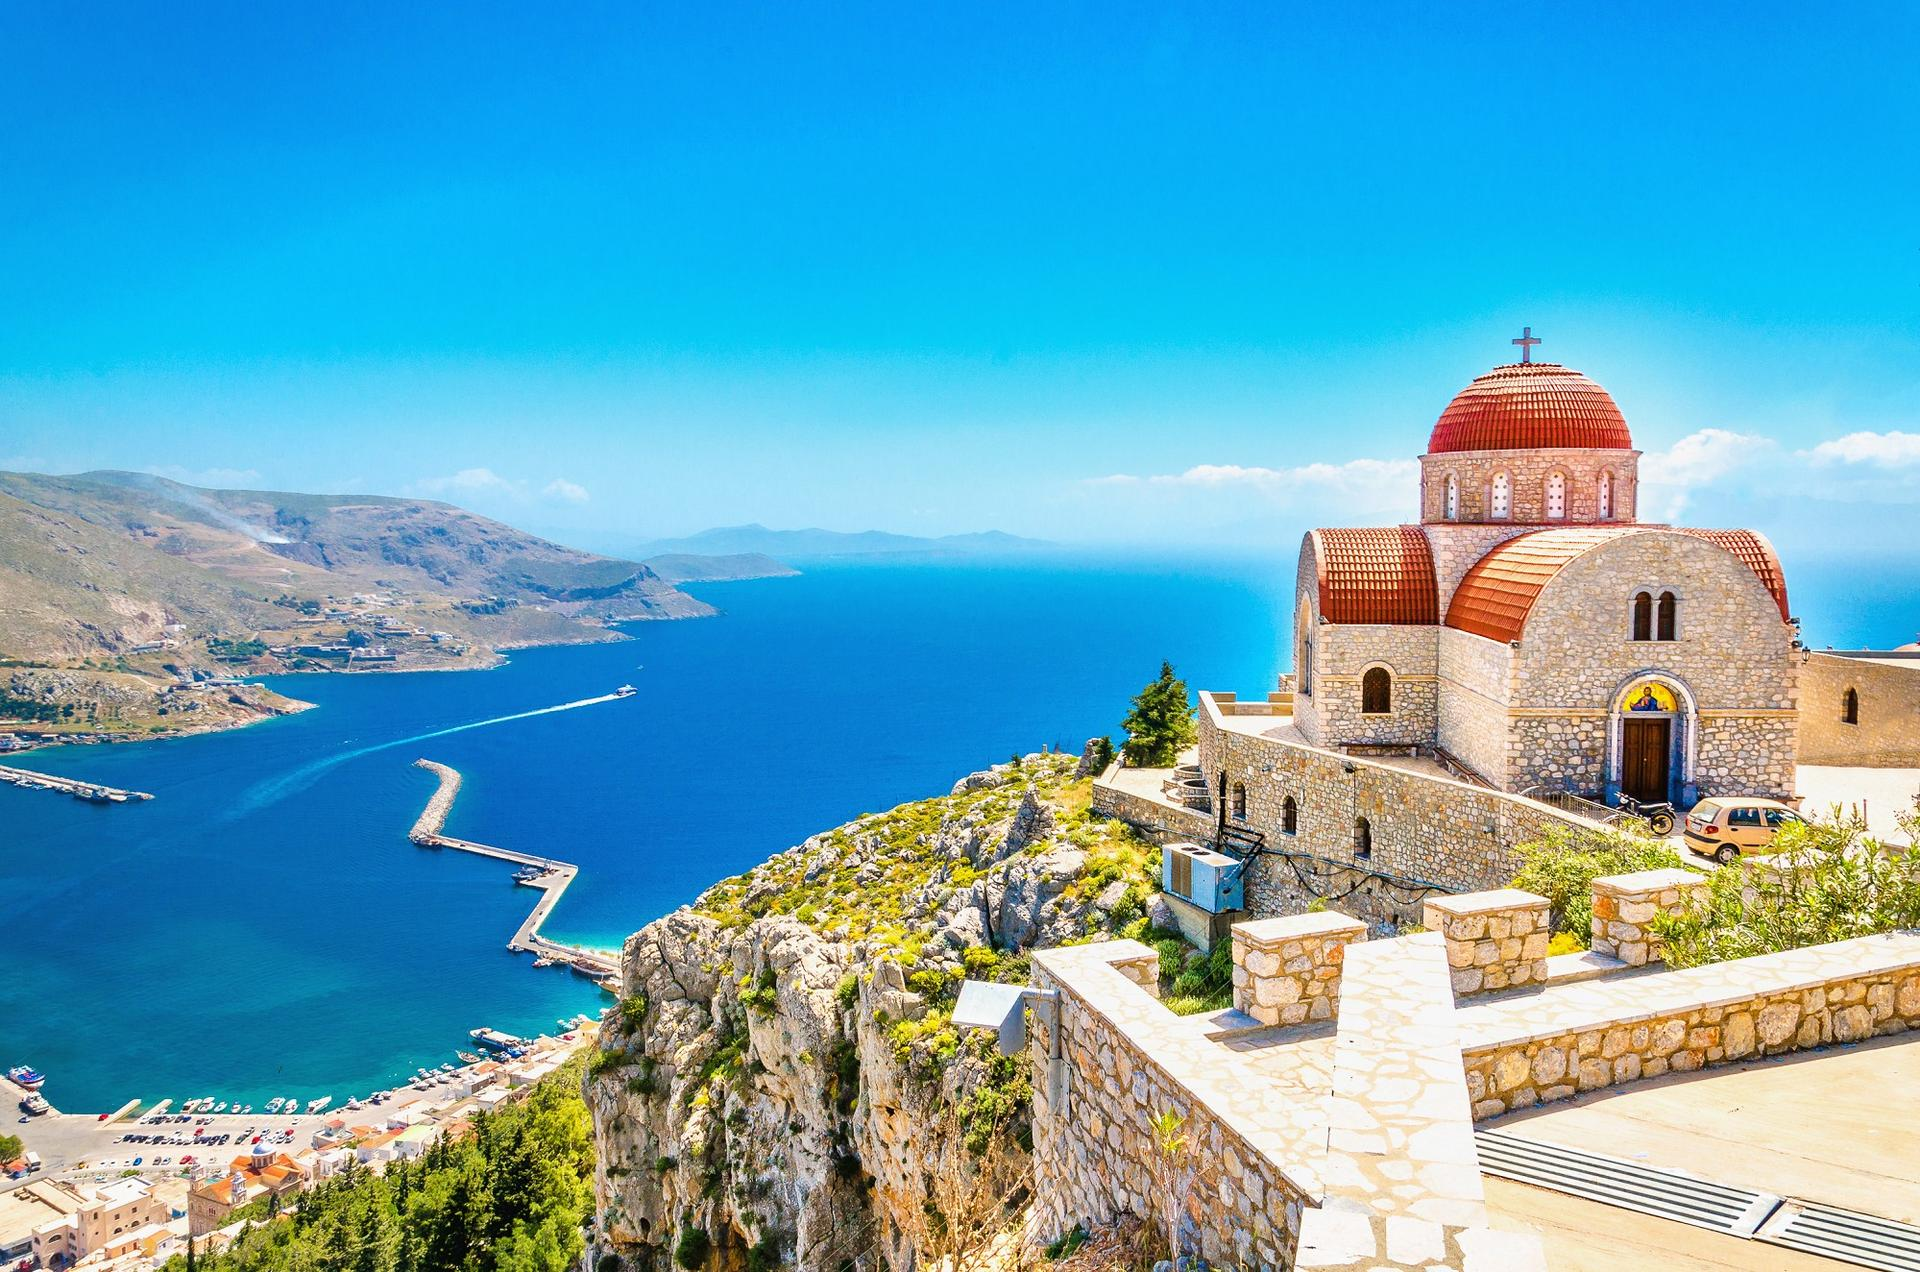 Griechenland istock